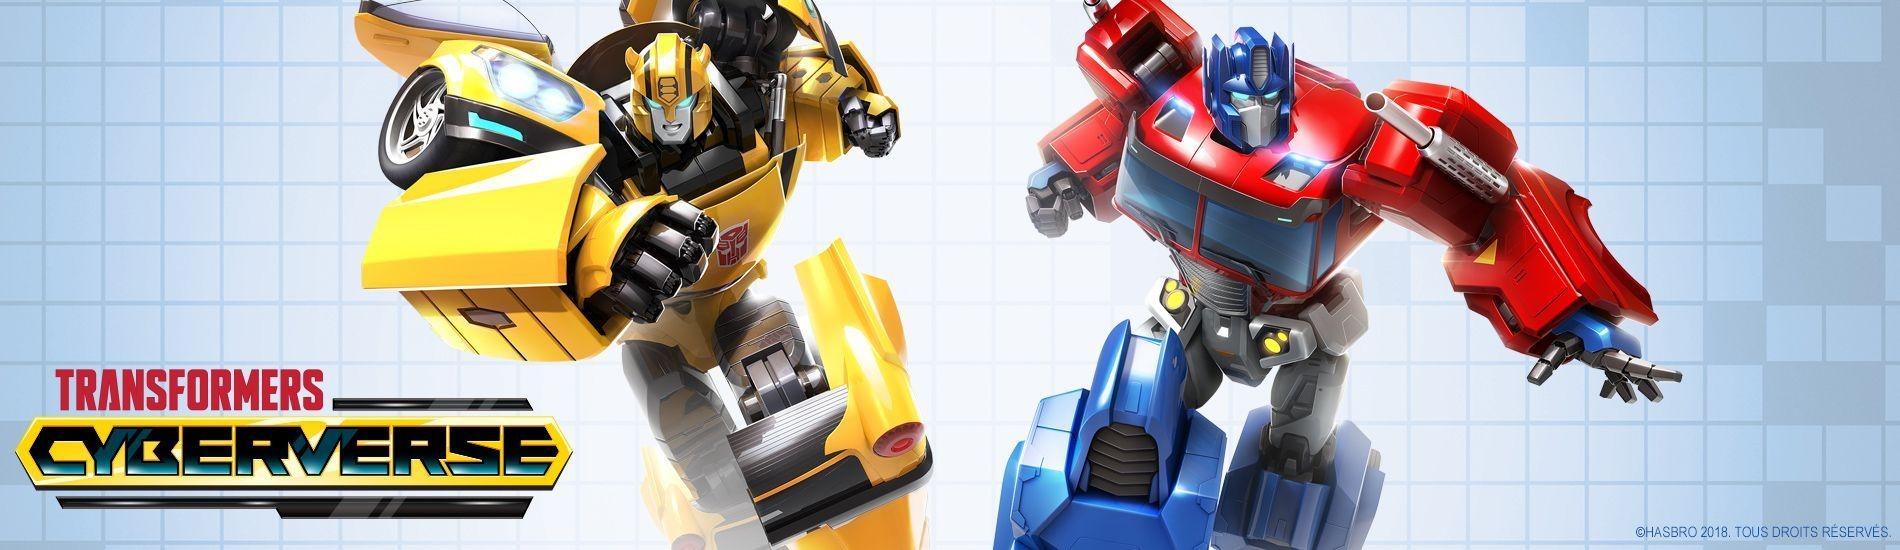 Transformers Cyberverse en streaming sur Gulli Replay